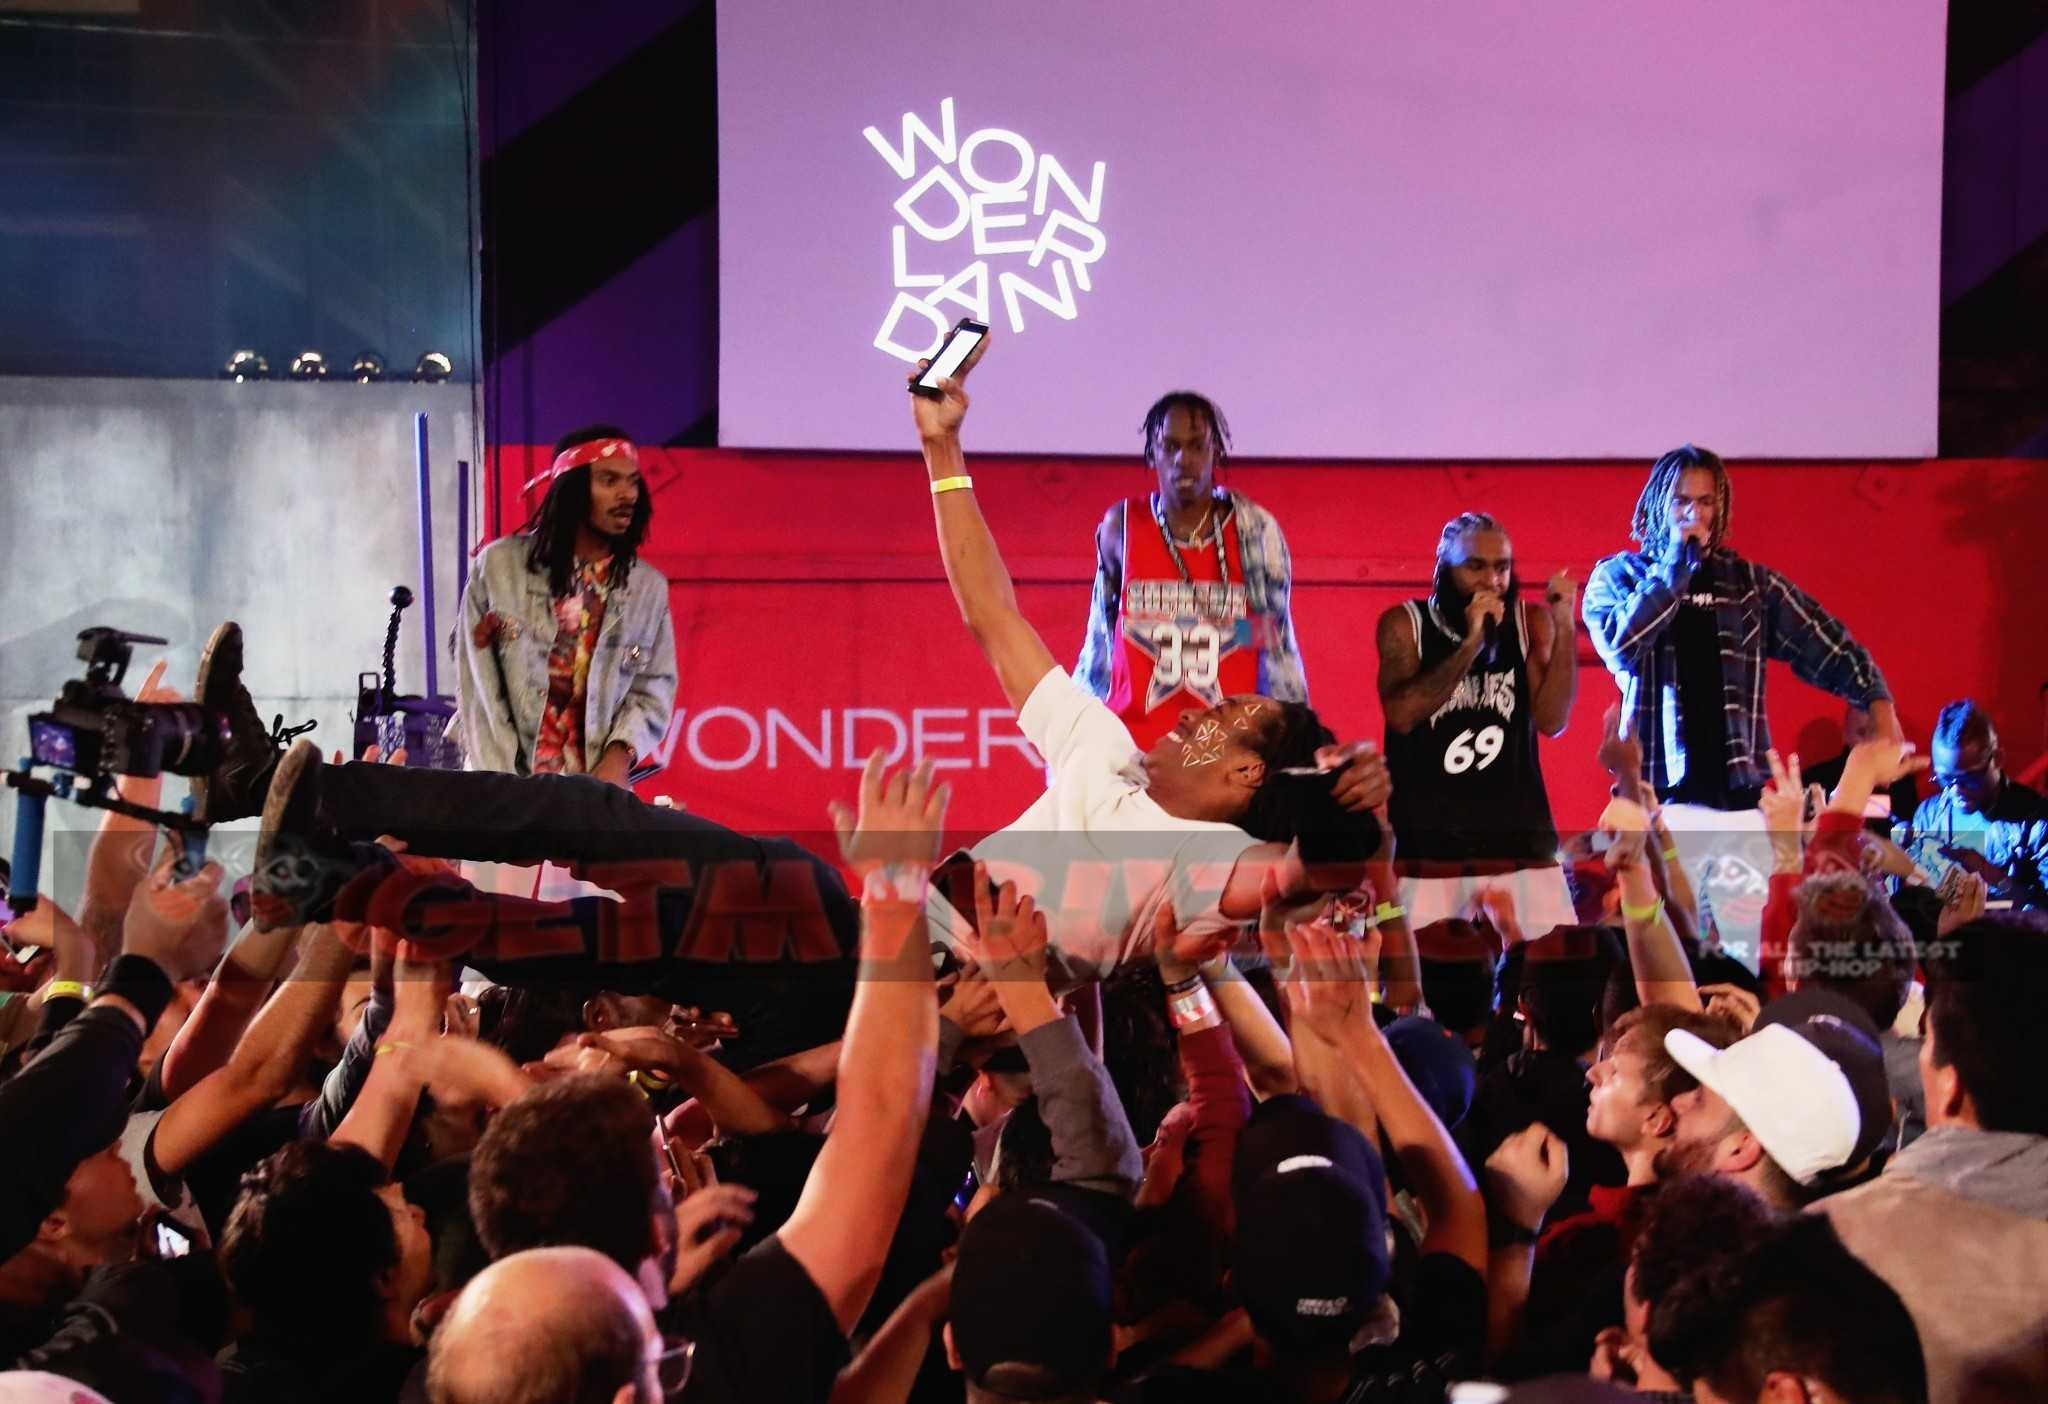 Watch: Flatbush Zombies Performing Live on Mtv's 'Wonderland' [Video + Photos]